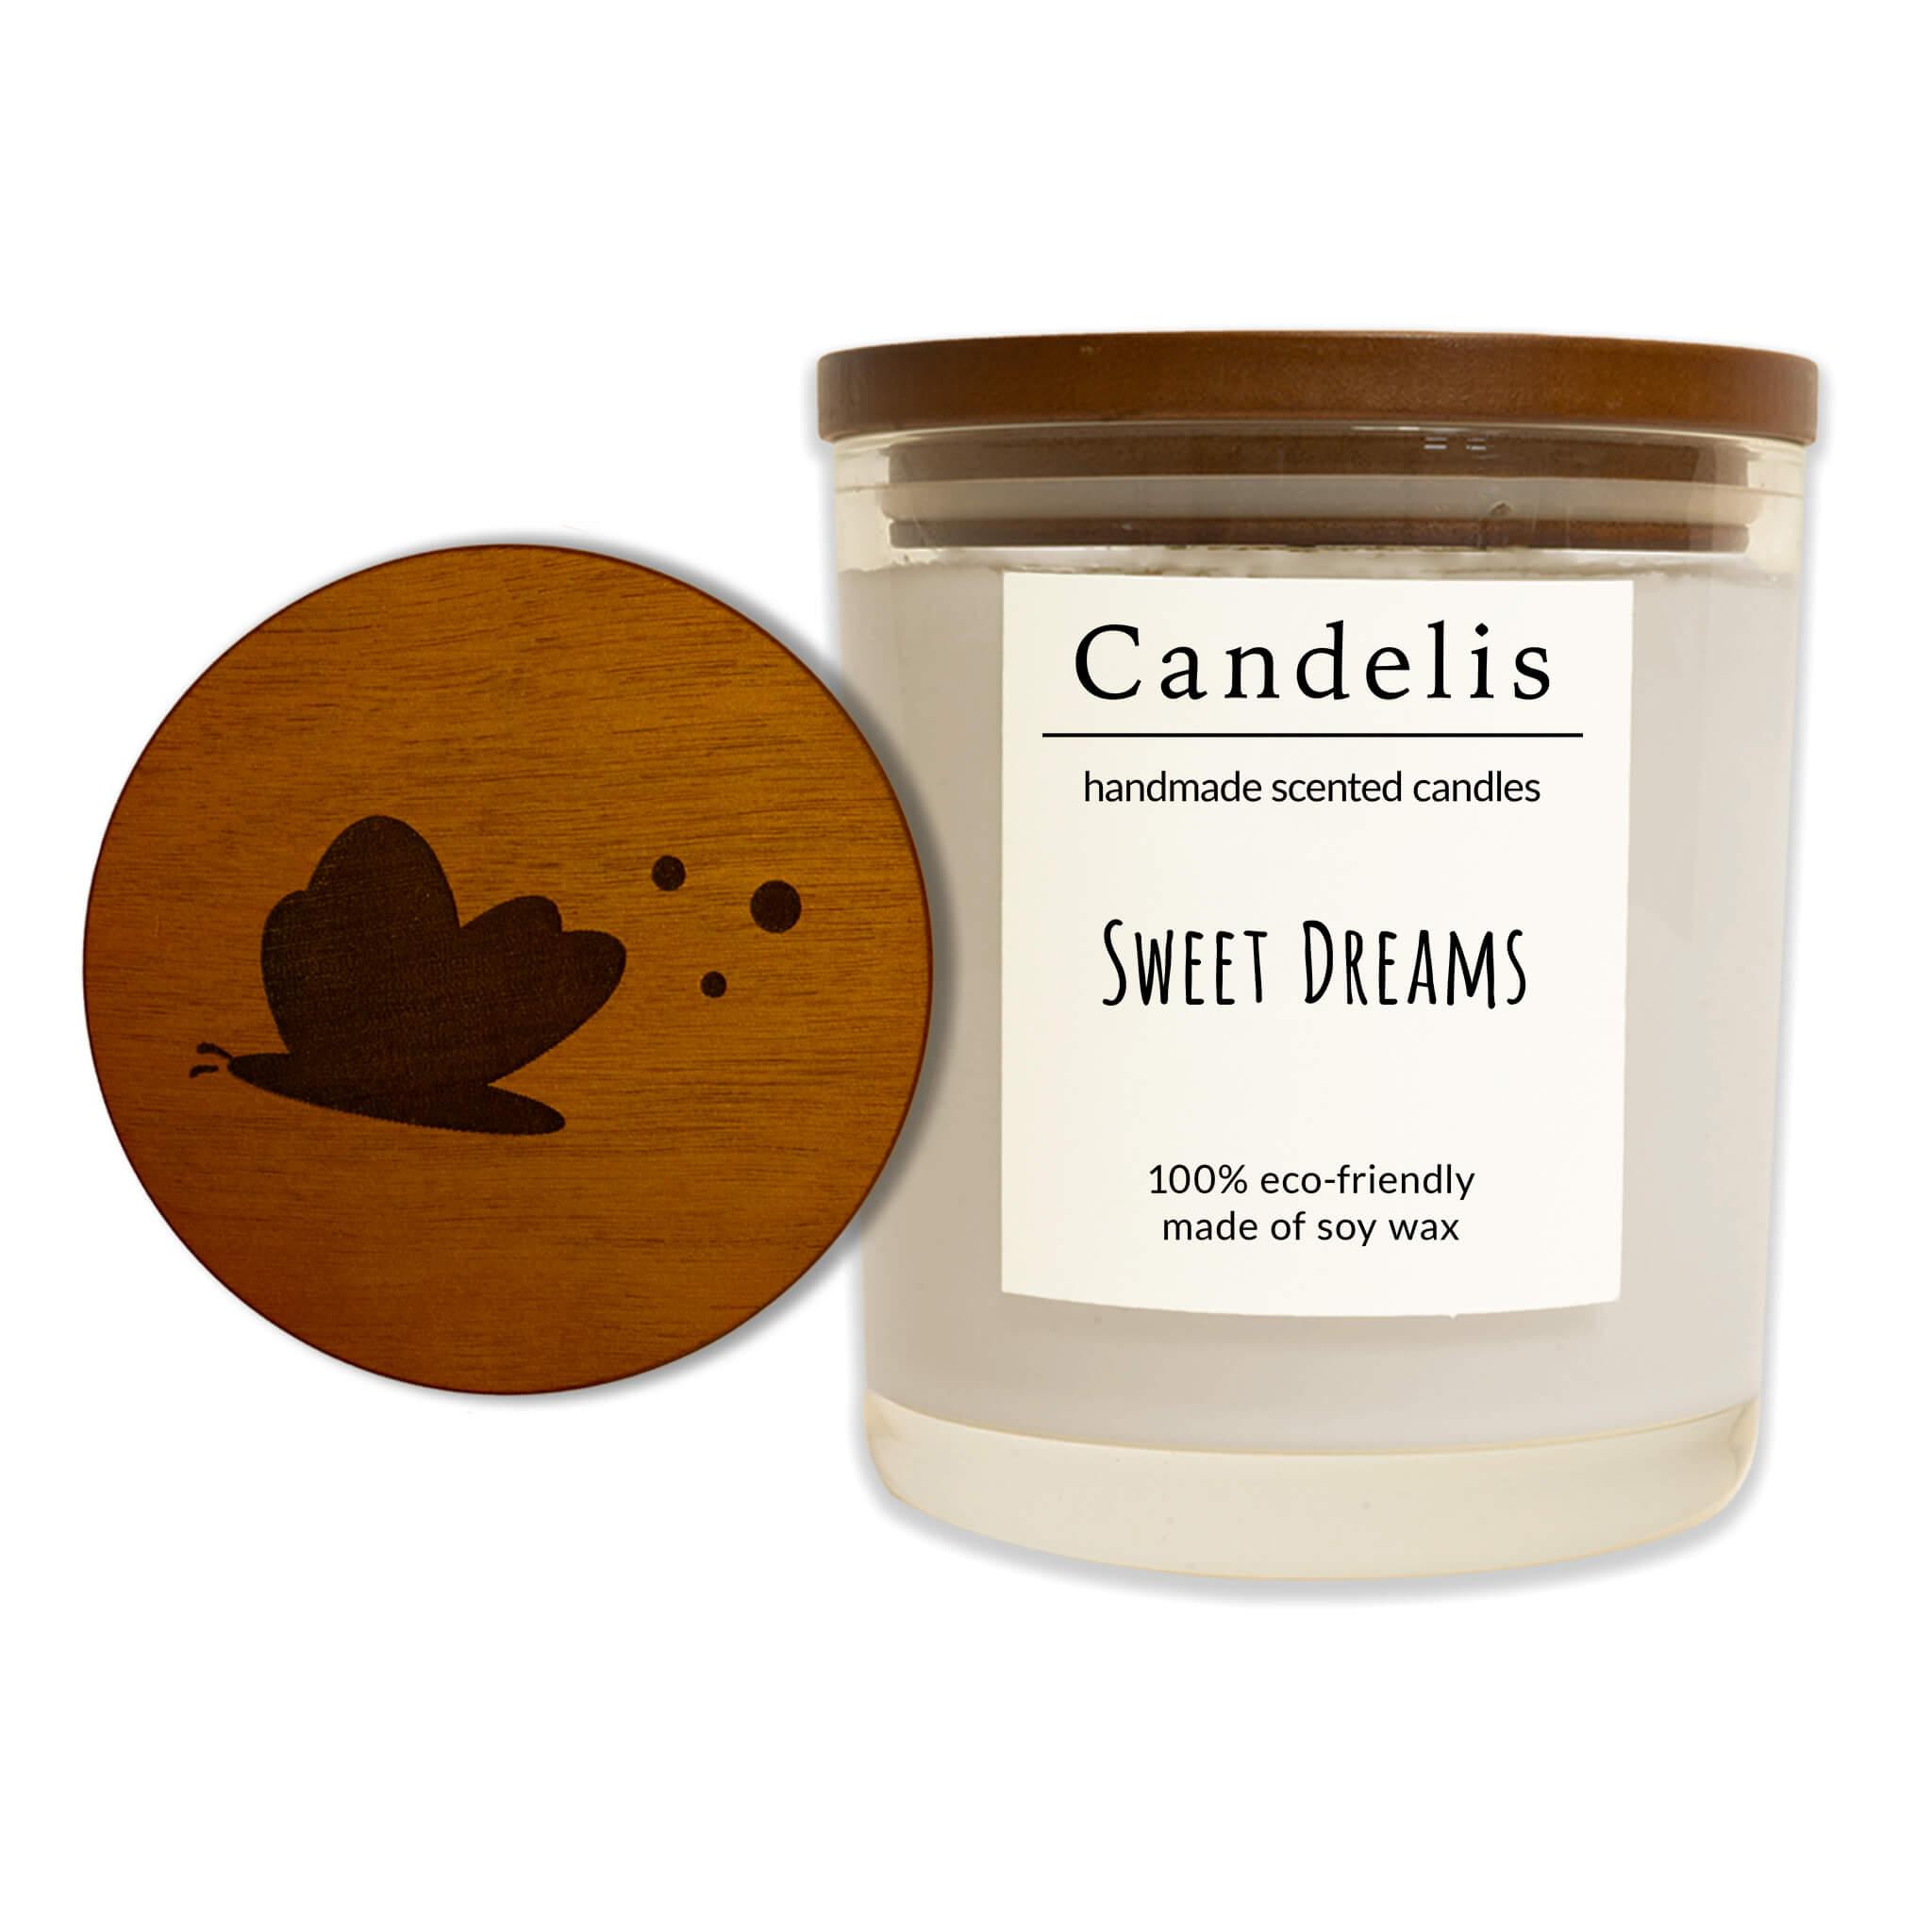 Sweet Dreams basis collectie single